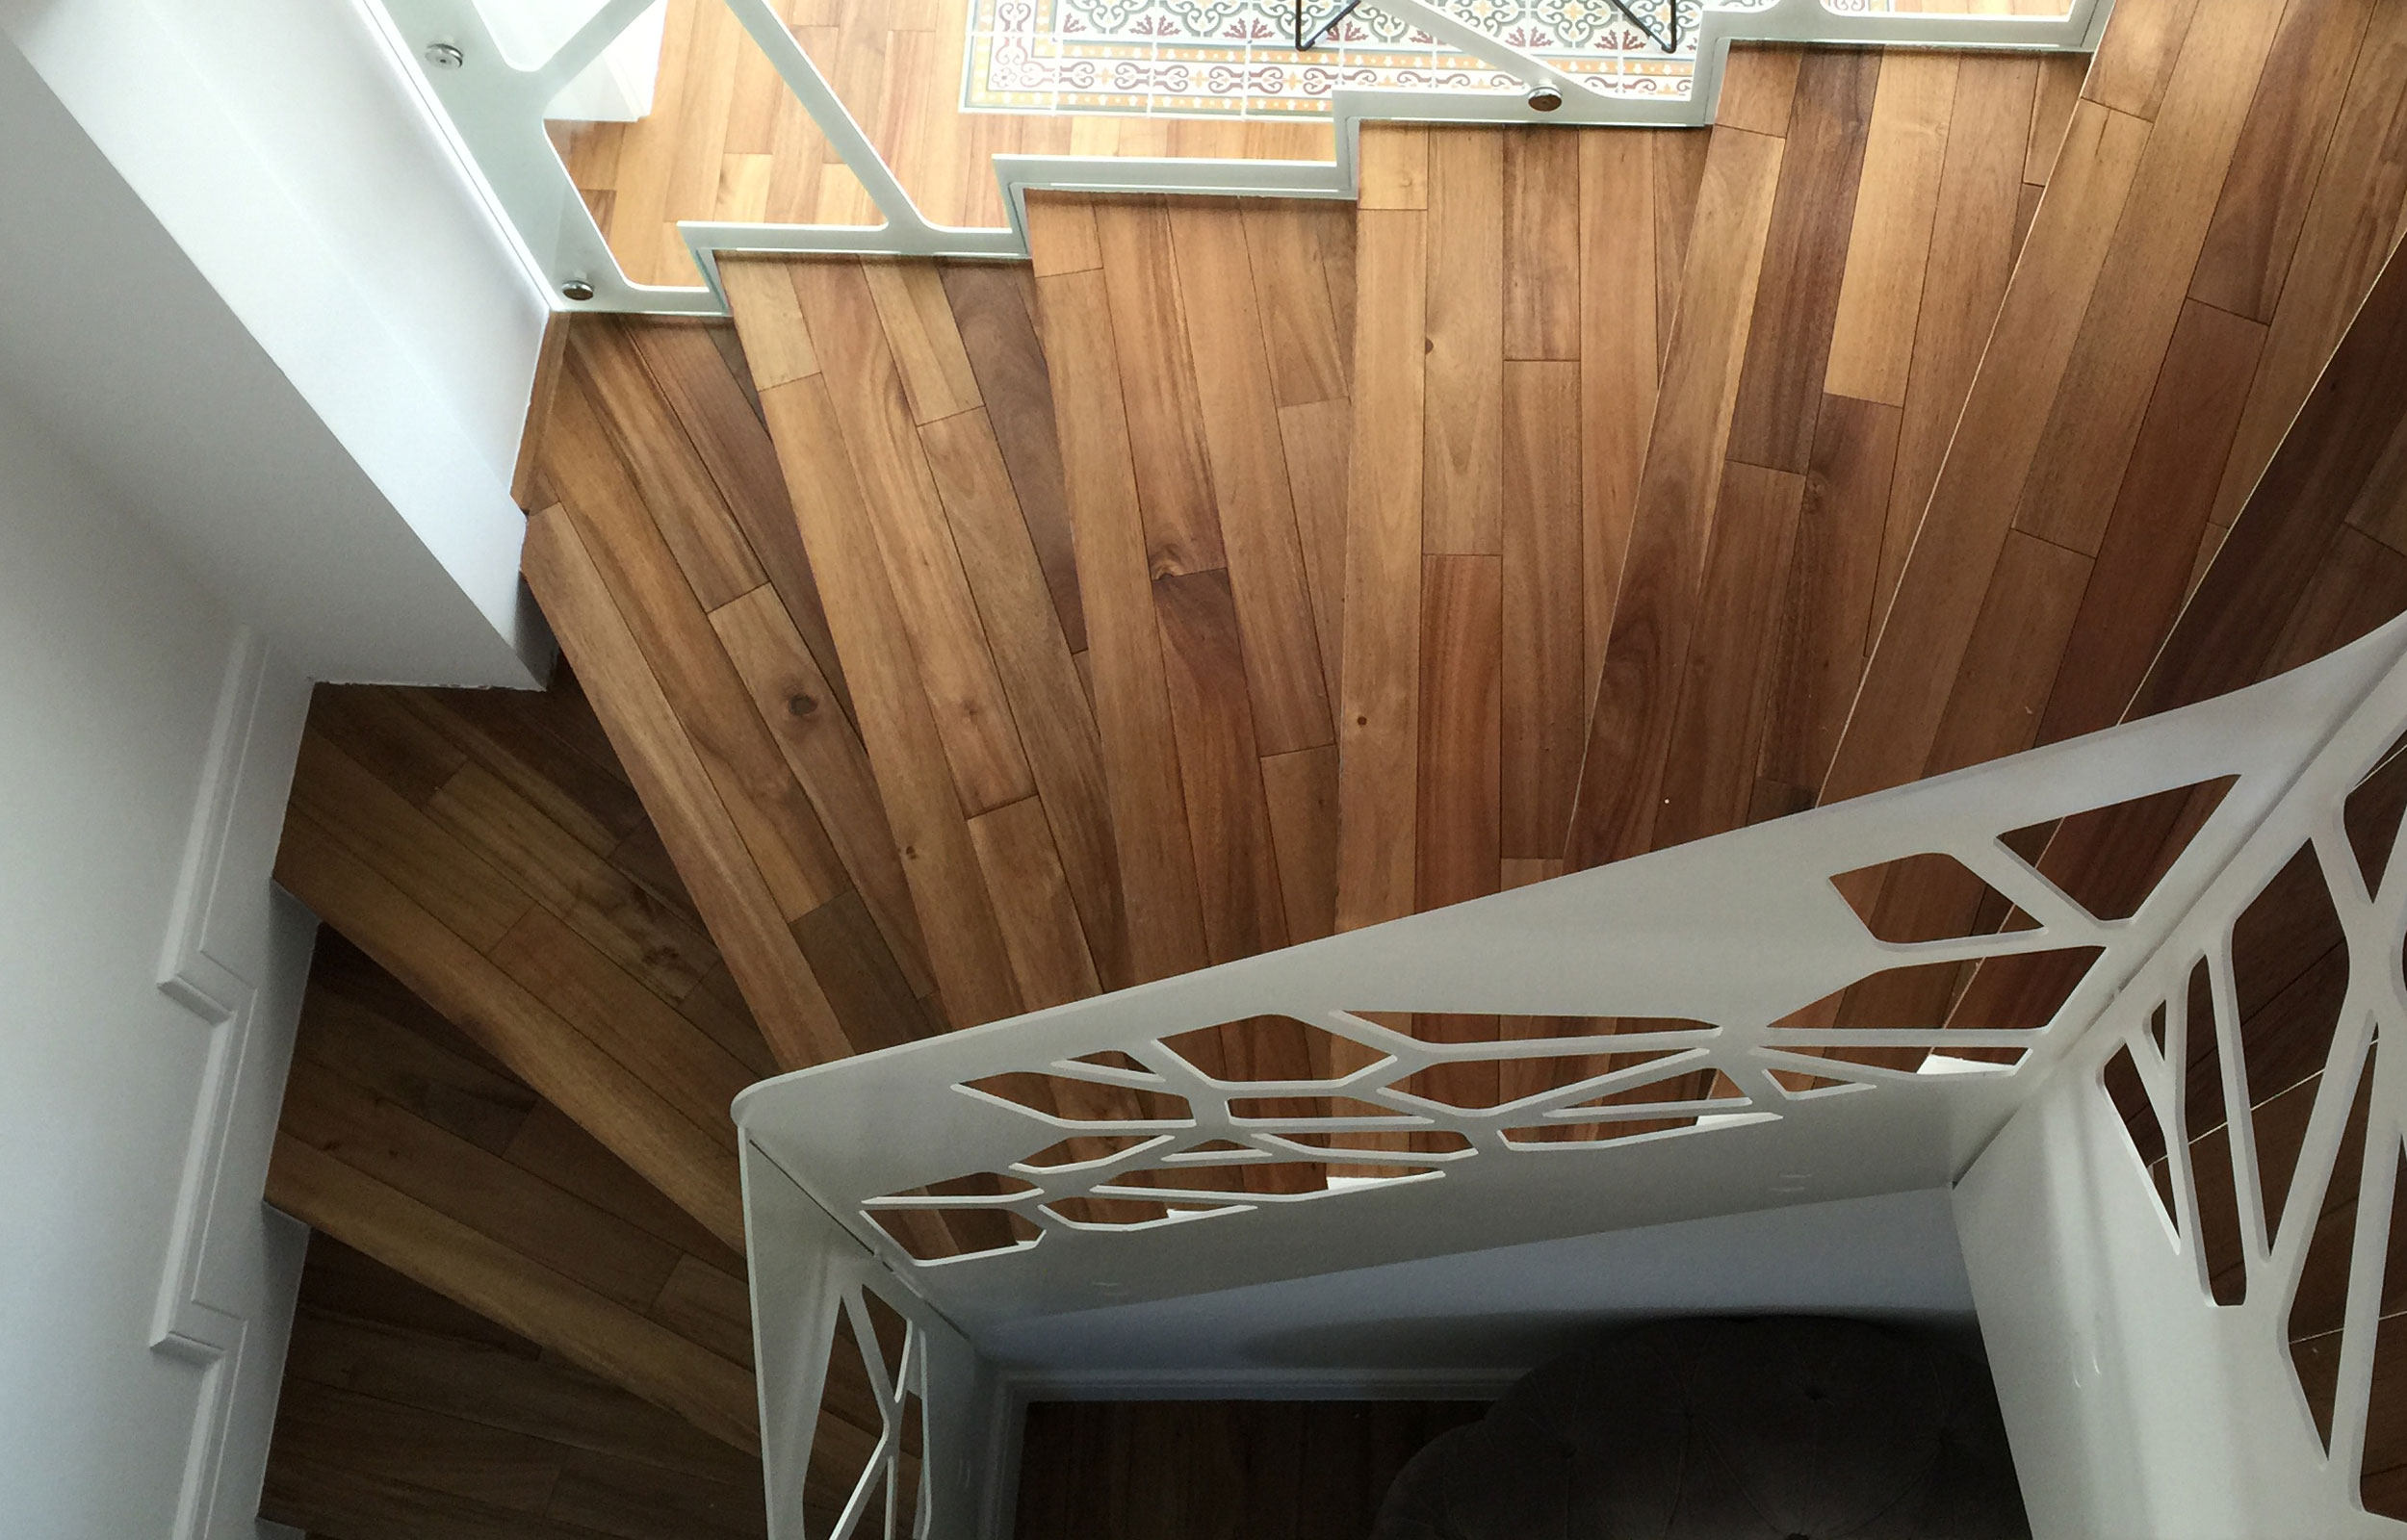 Scara interioara trepte lemn balustrada metal haute couture